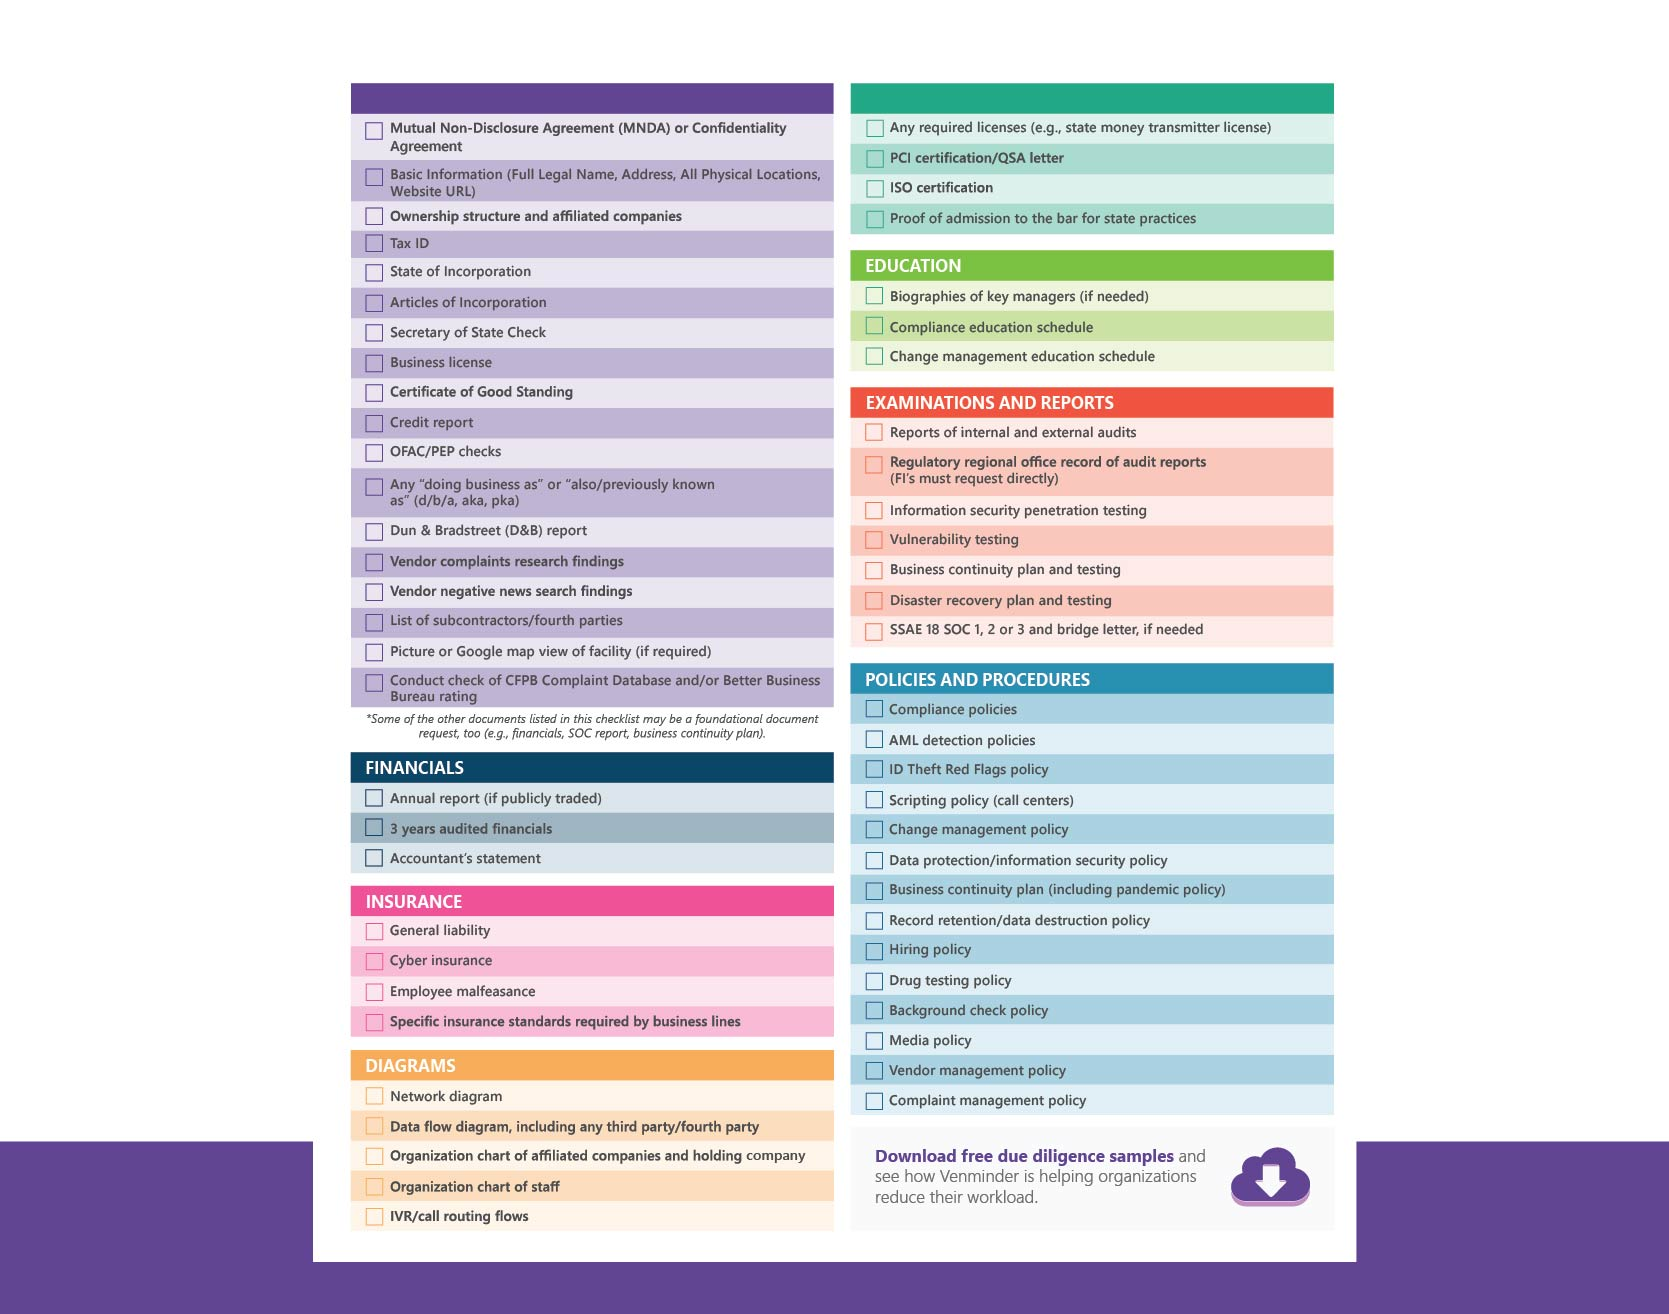 2019_resources_model_vendor_due_diligence_checklist